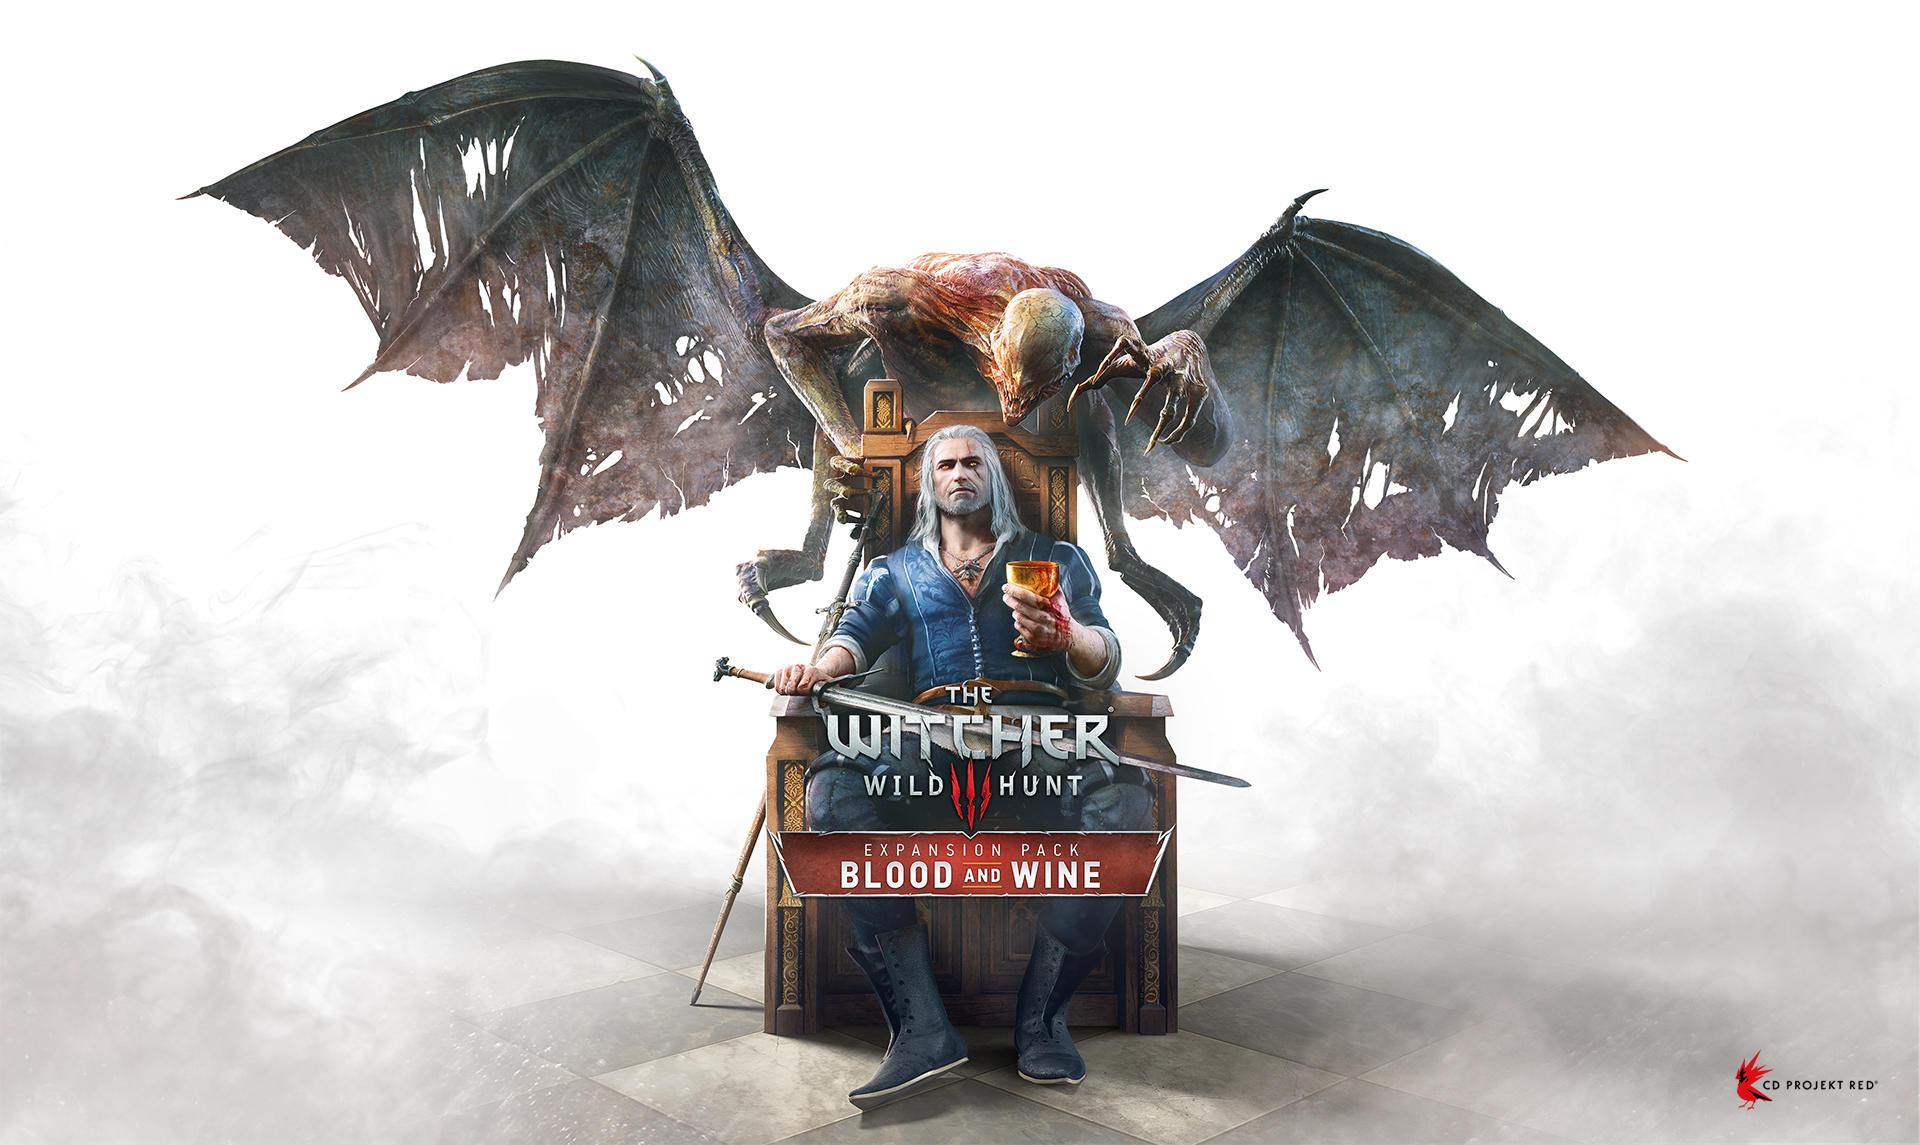 Witcher 3: Wild Hunt - Blood and Wine by daRoz